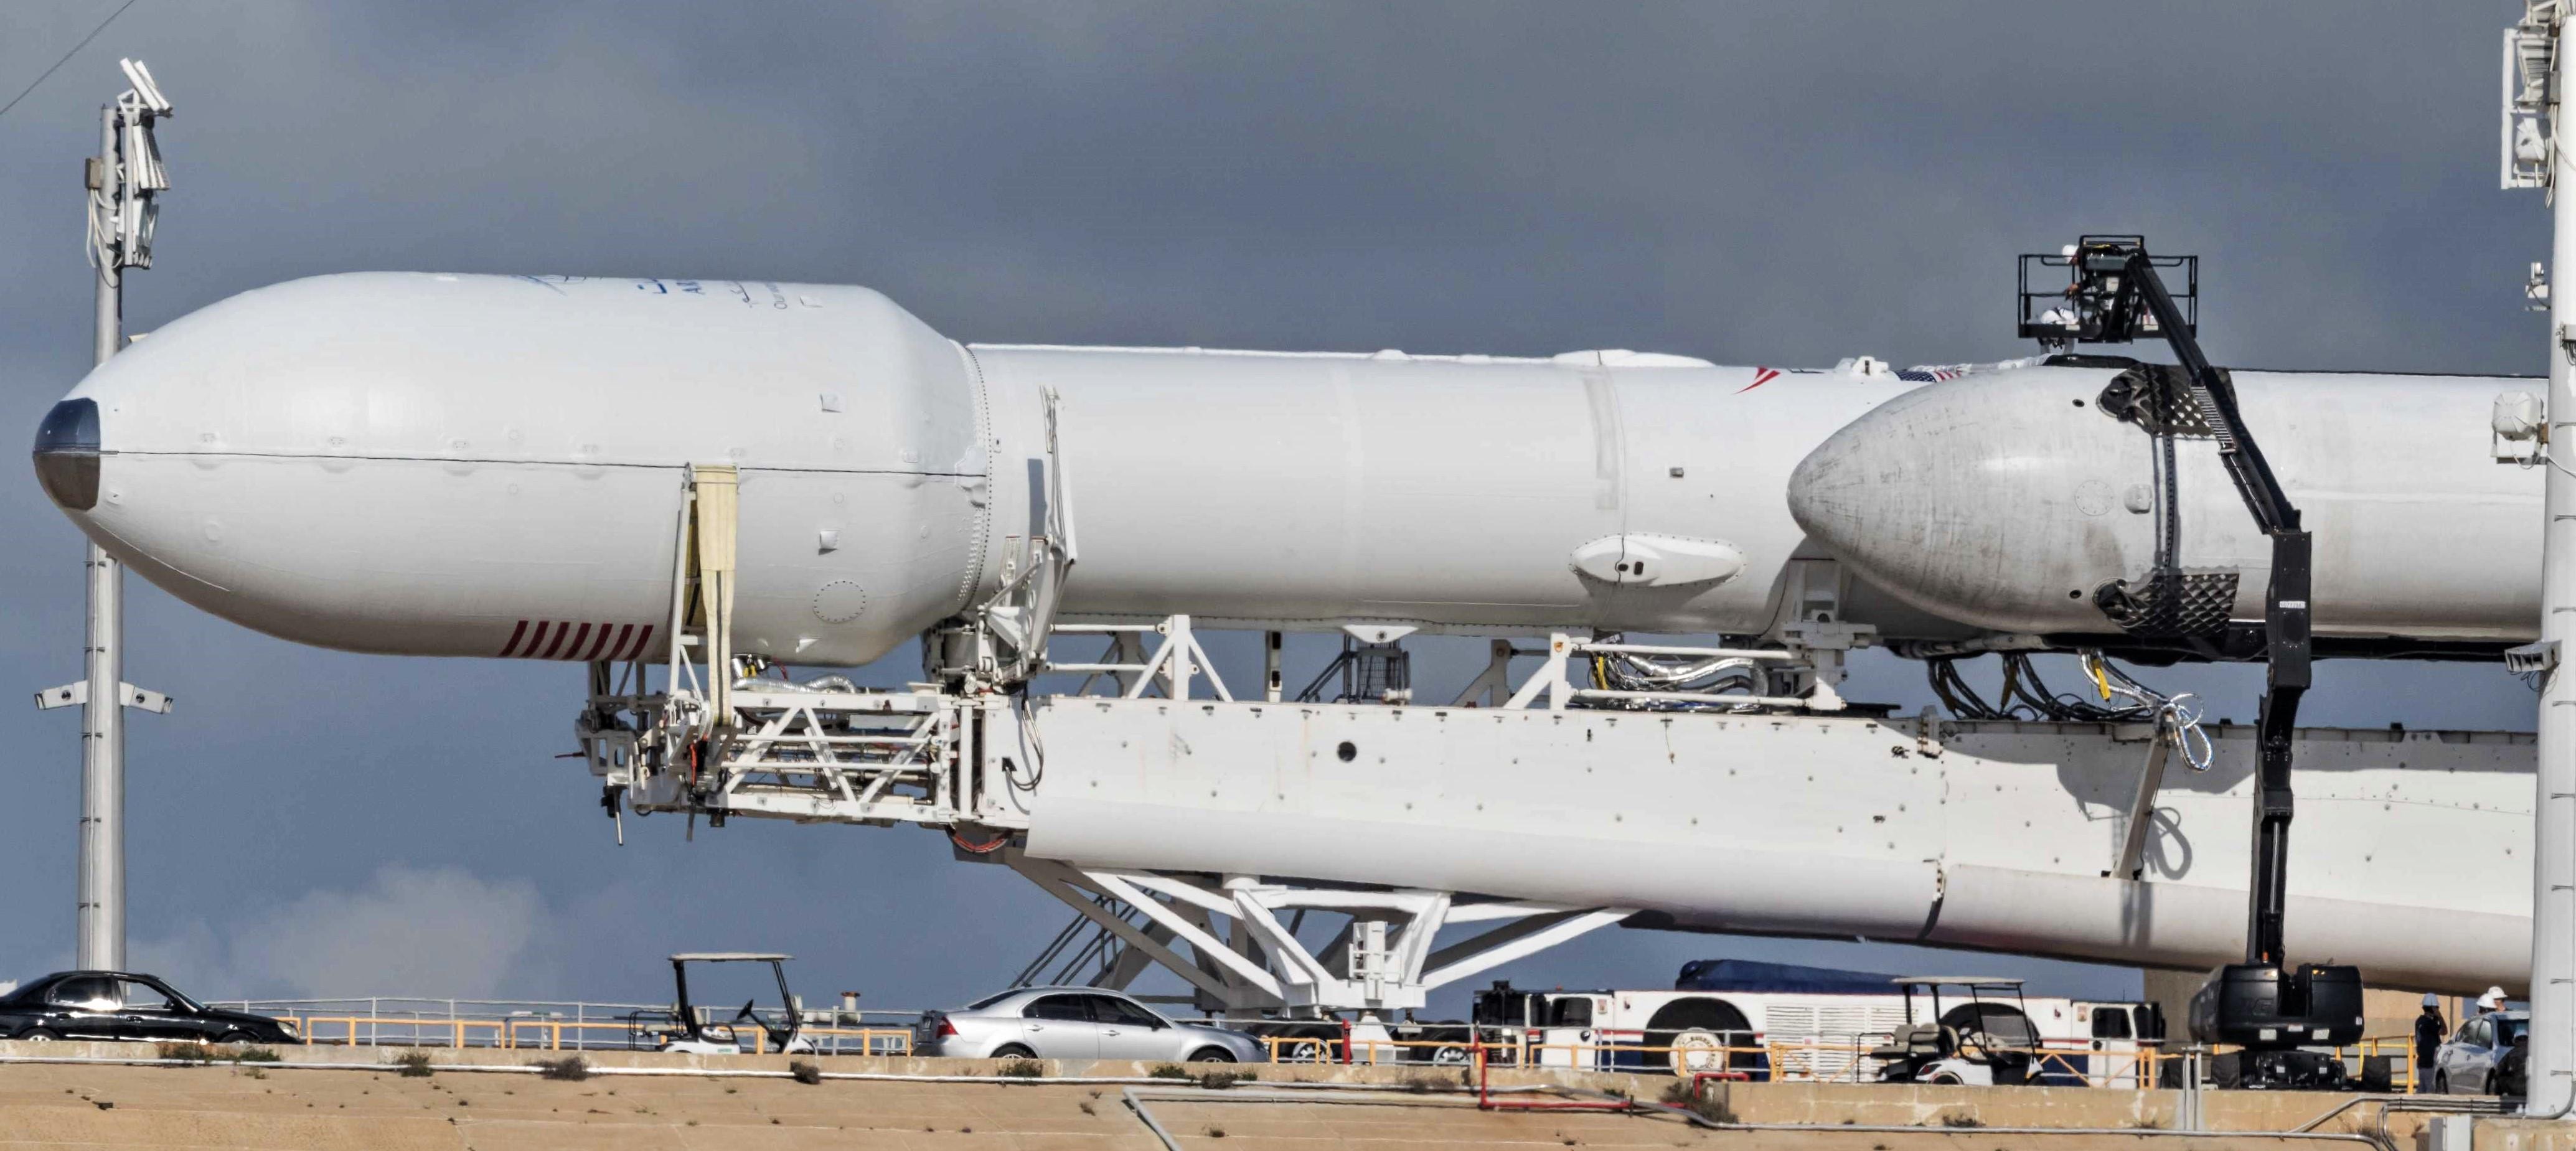 Falcon Heavy Flight 2 prelaunch 39A (Pauline Acalin) pano 7 edit